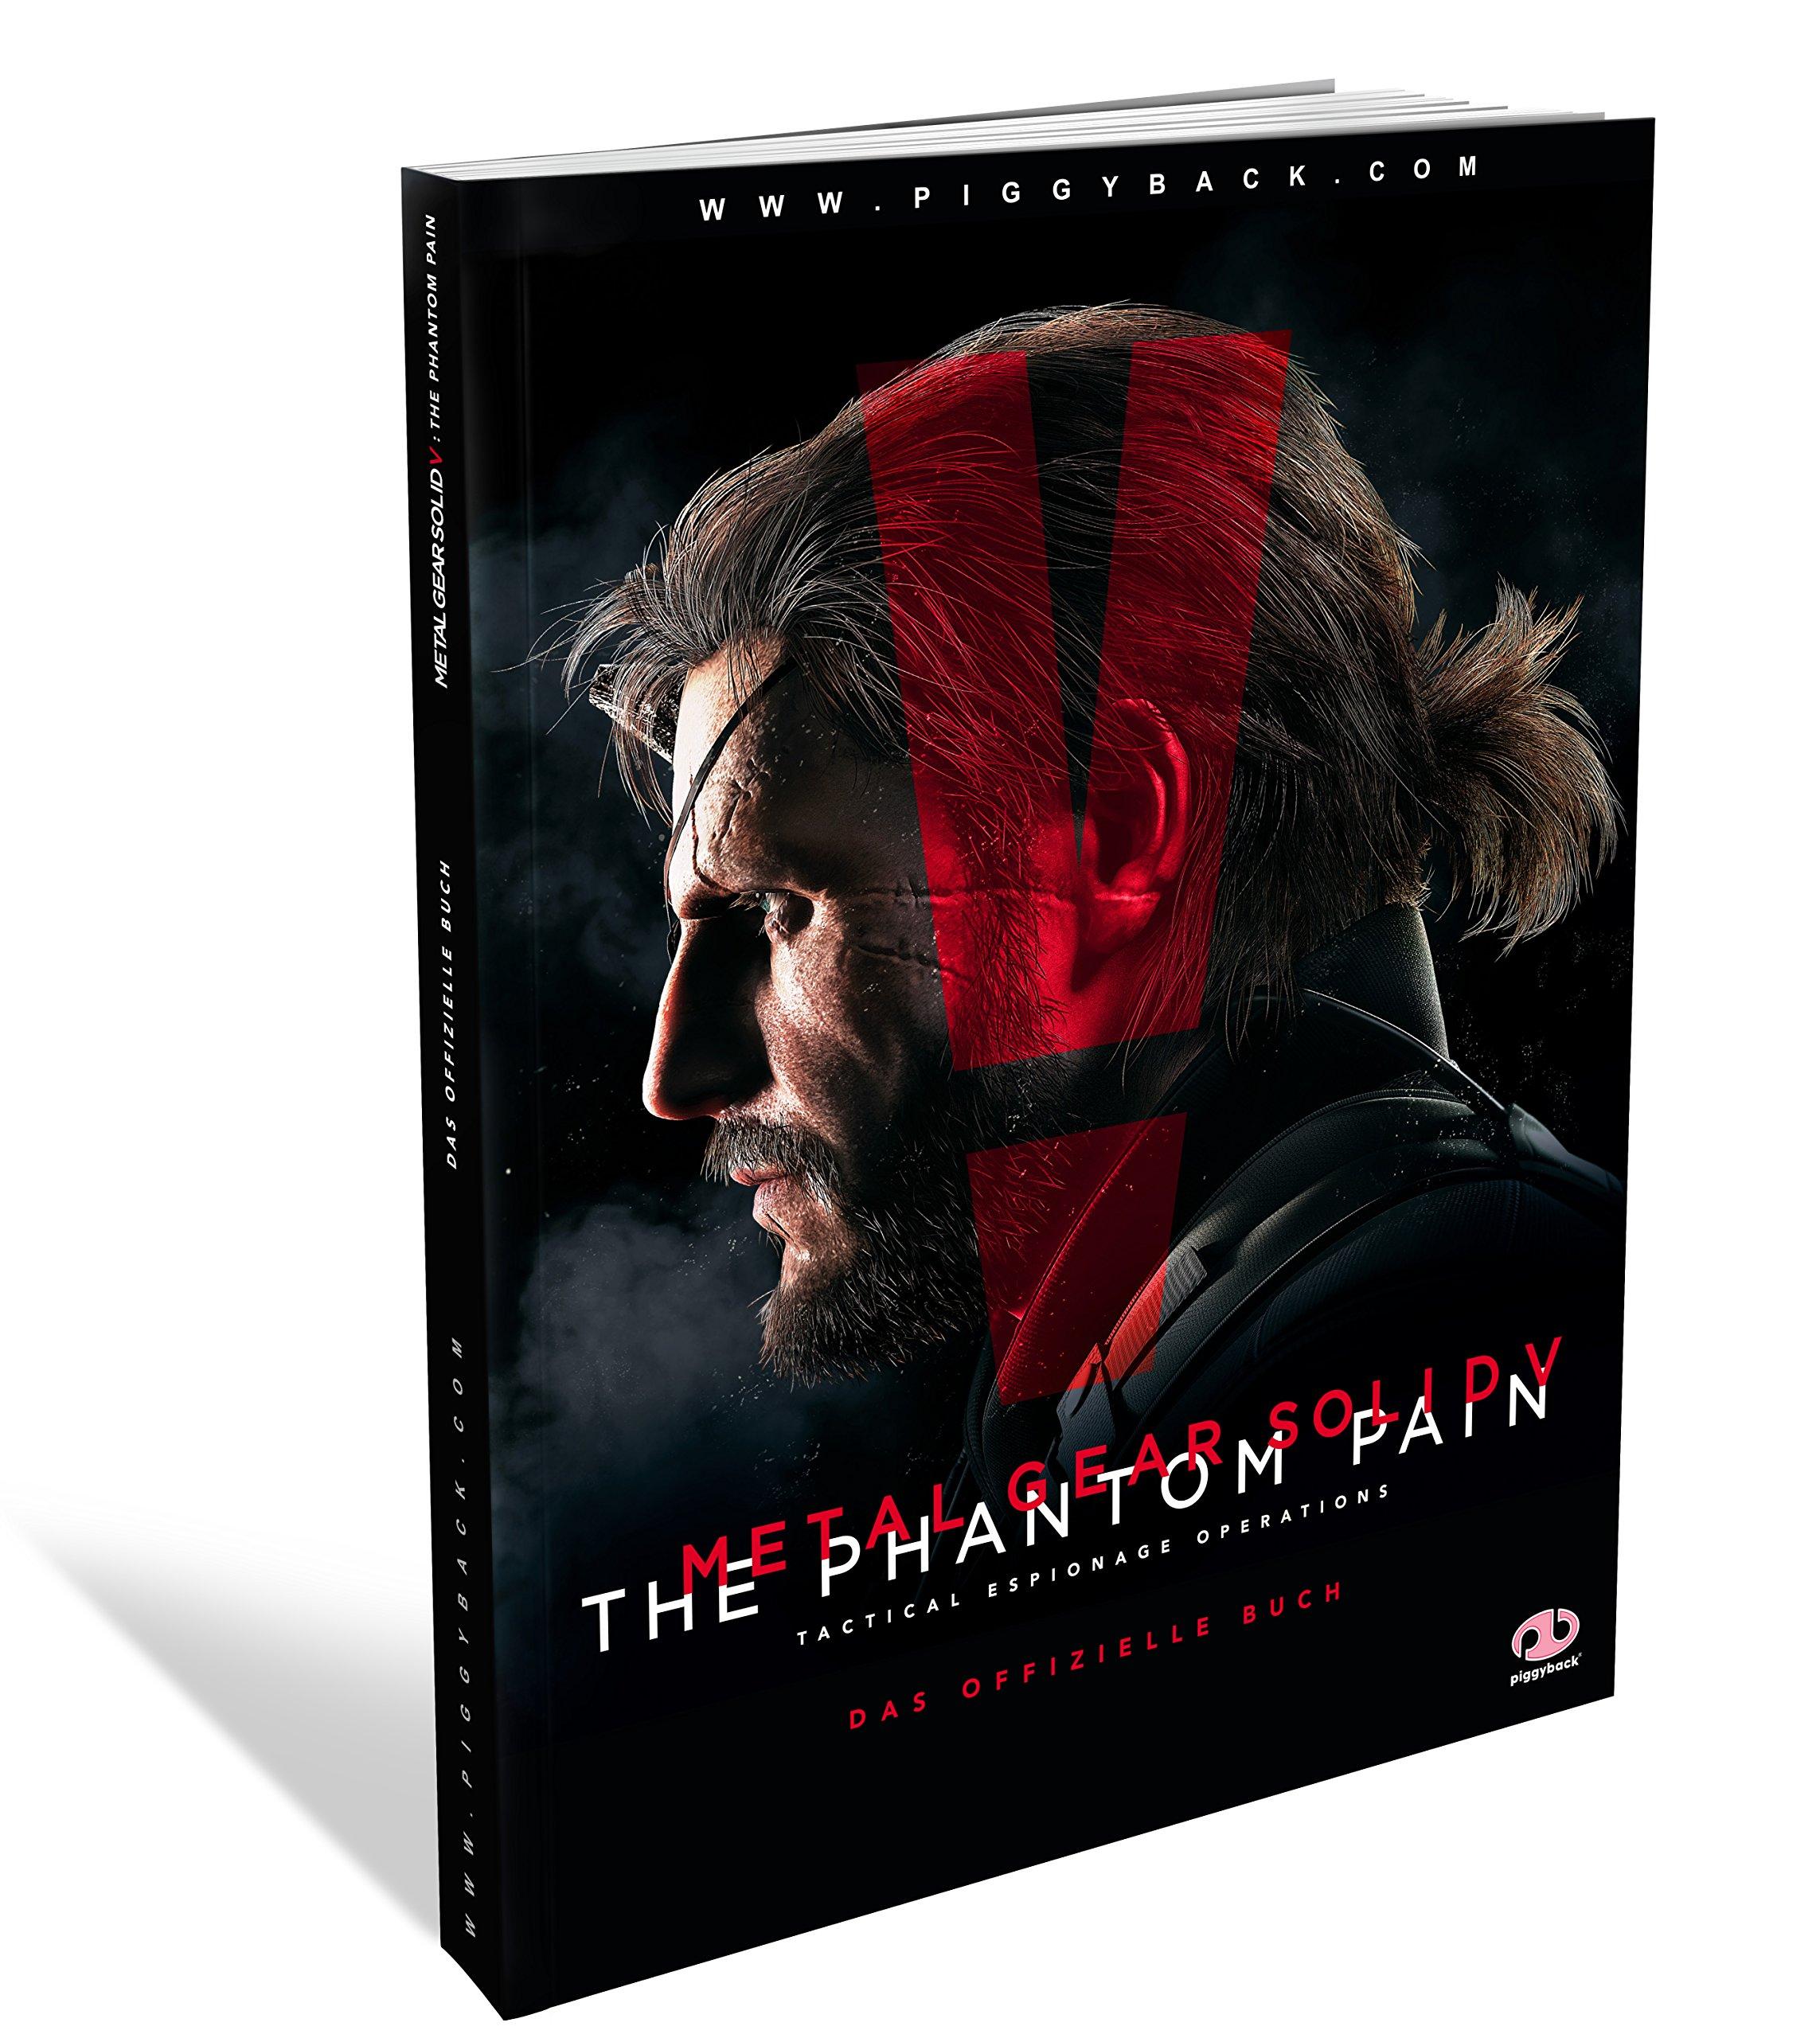 Metal Gear Solid 5 - The Phantom Pain (Offizielles Lösungsbuch)